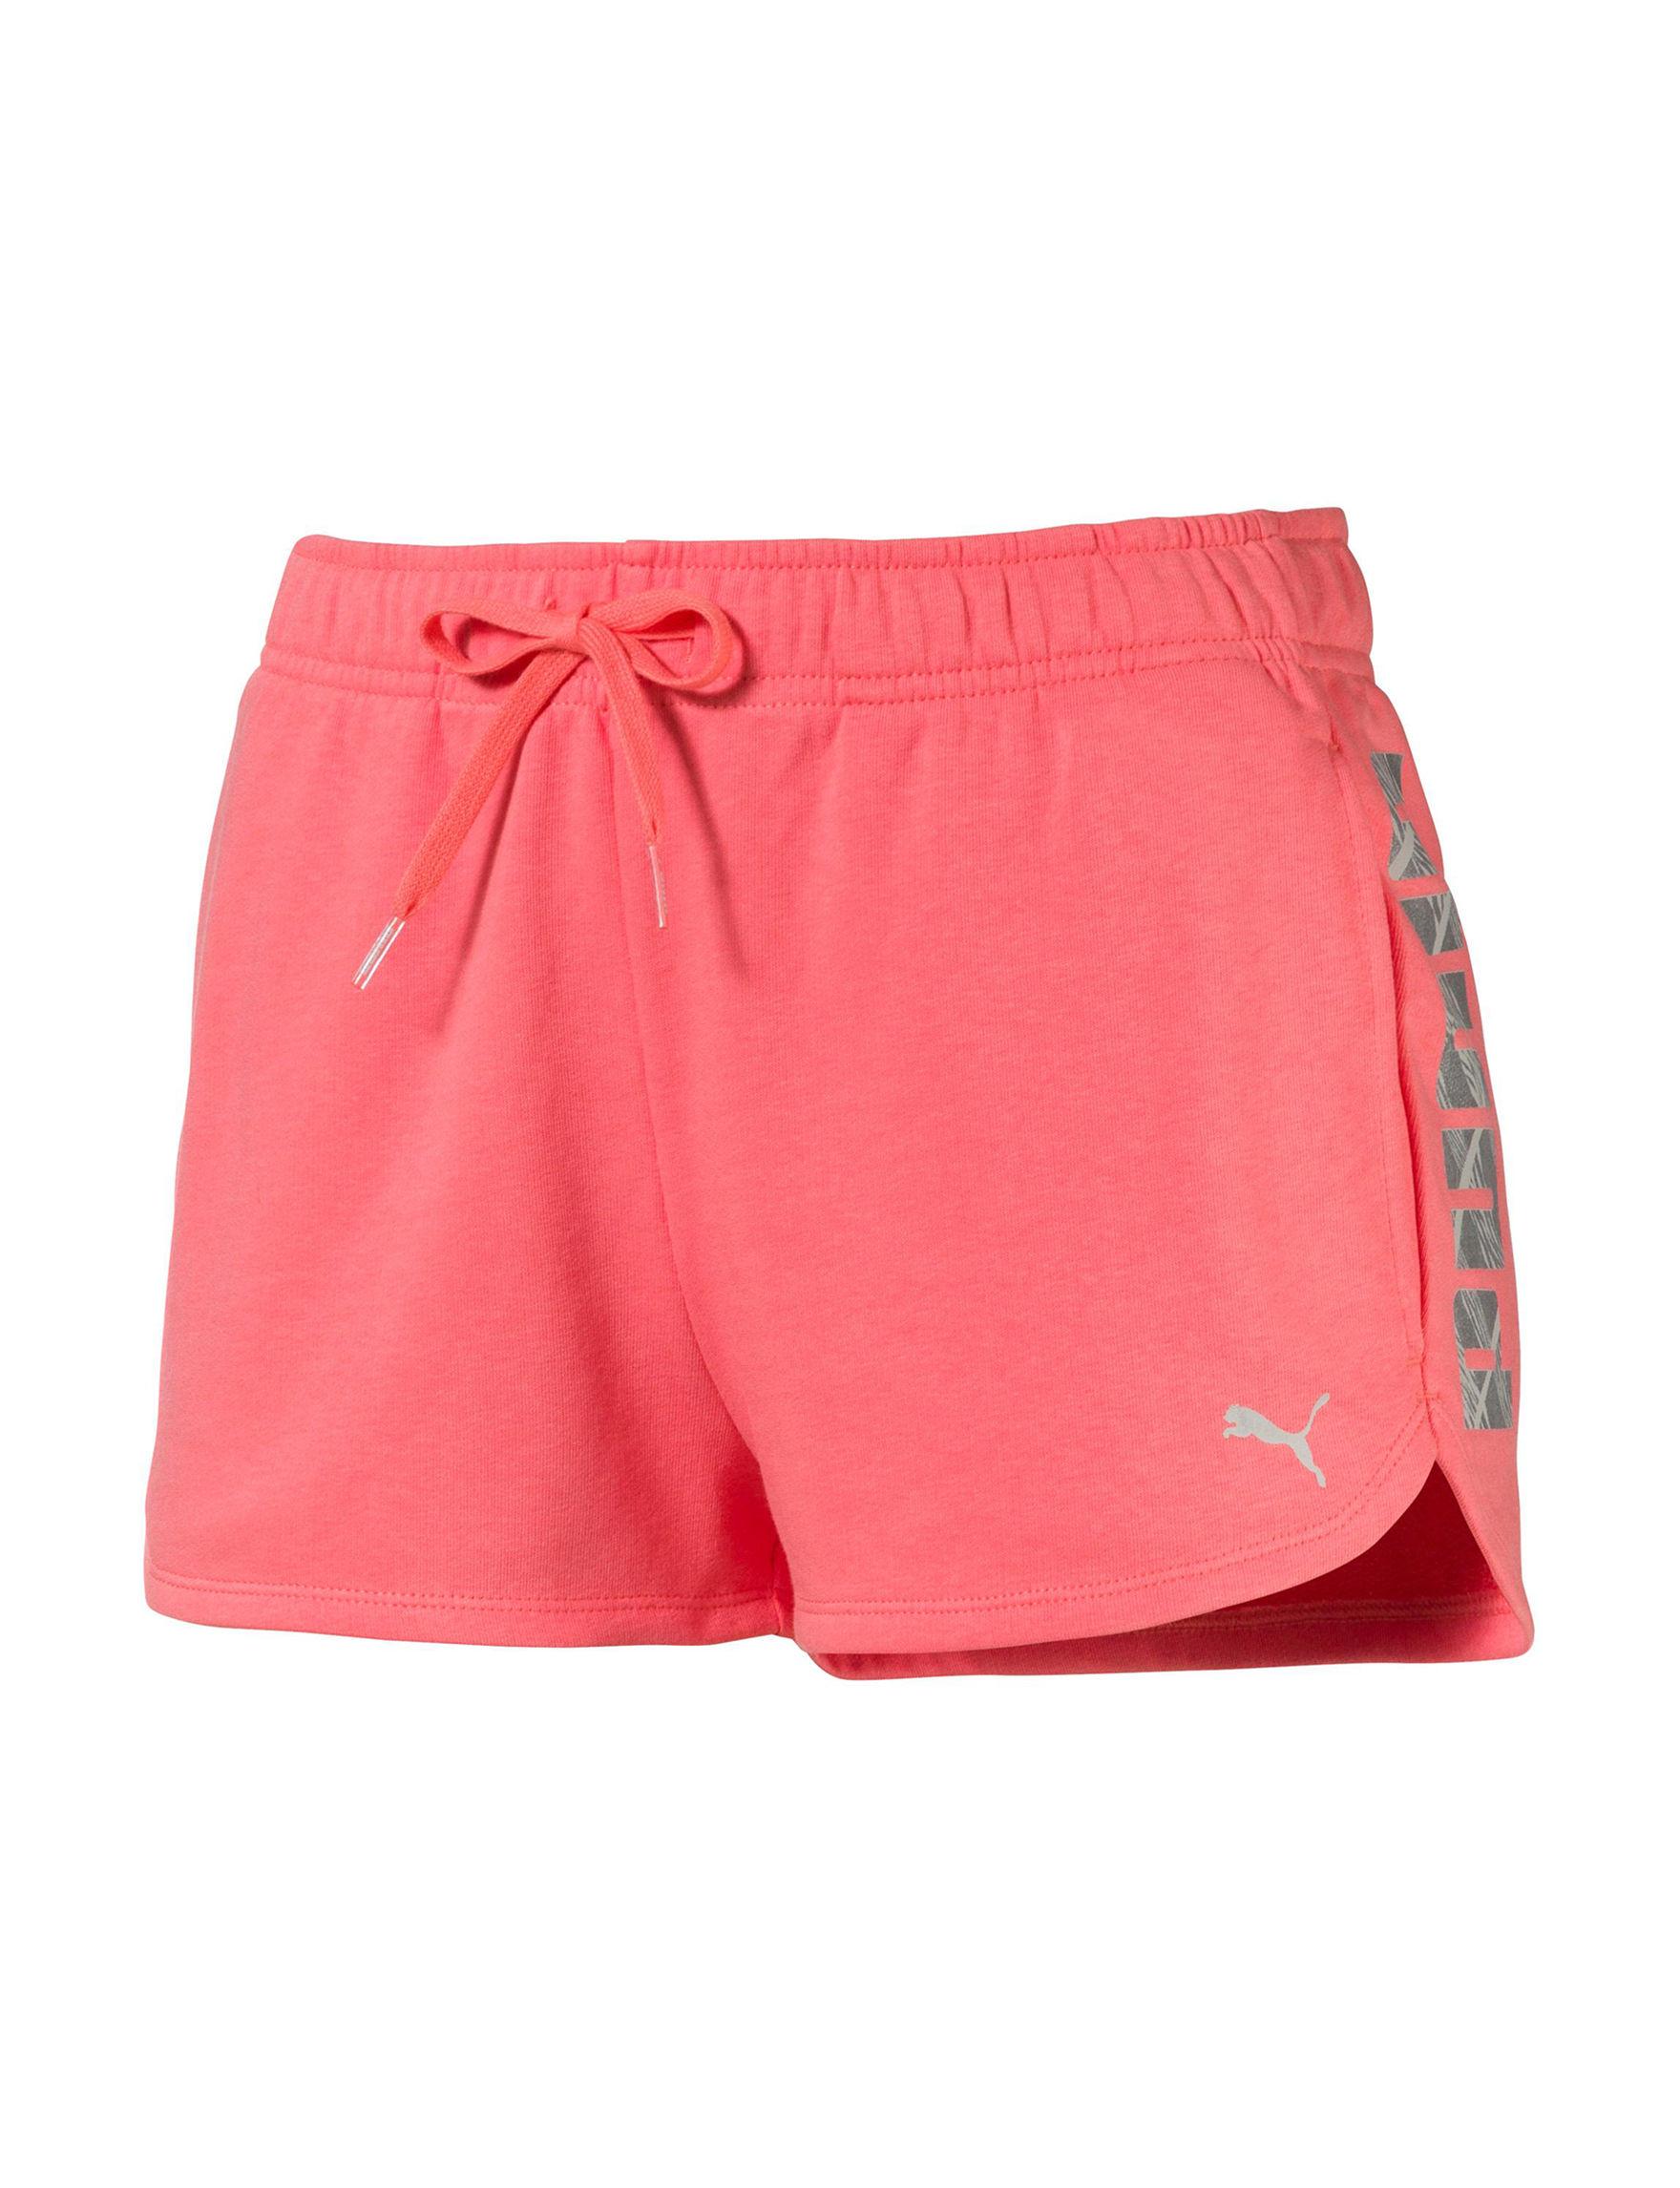 Puma Pink Soft Shorts